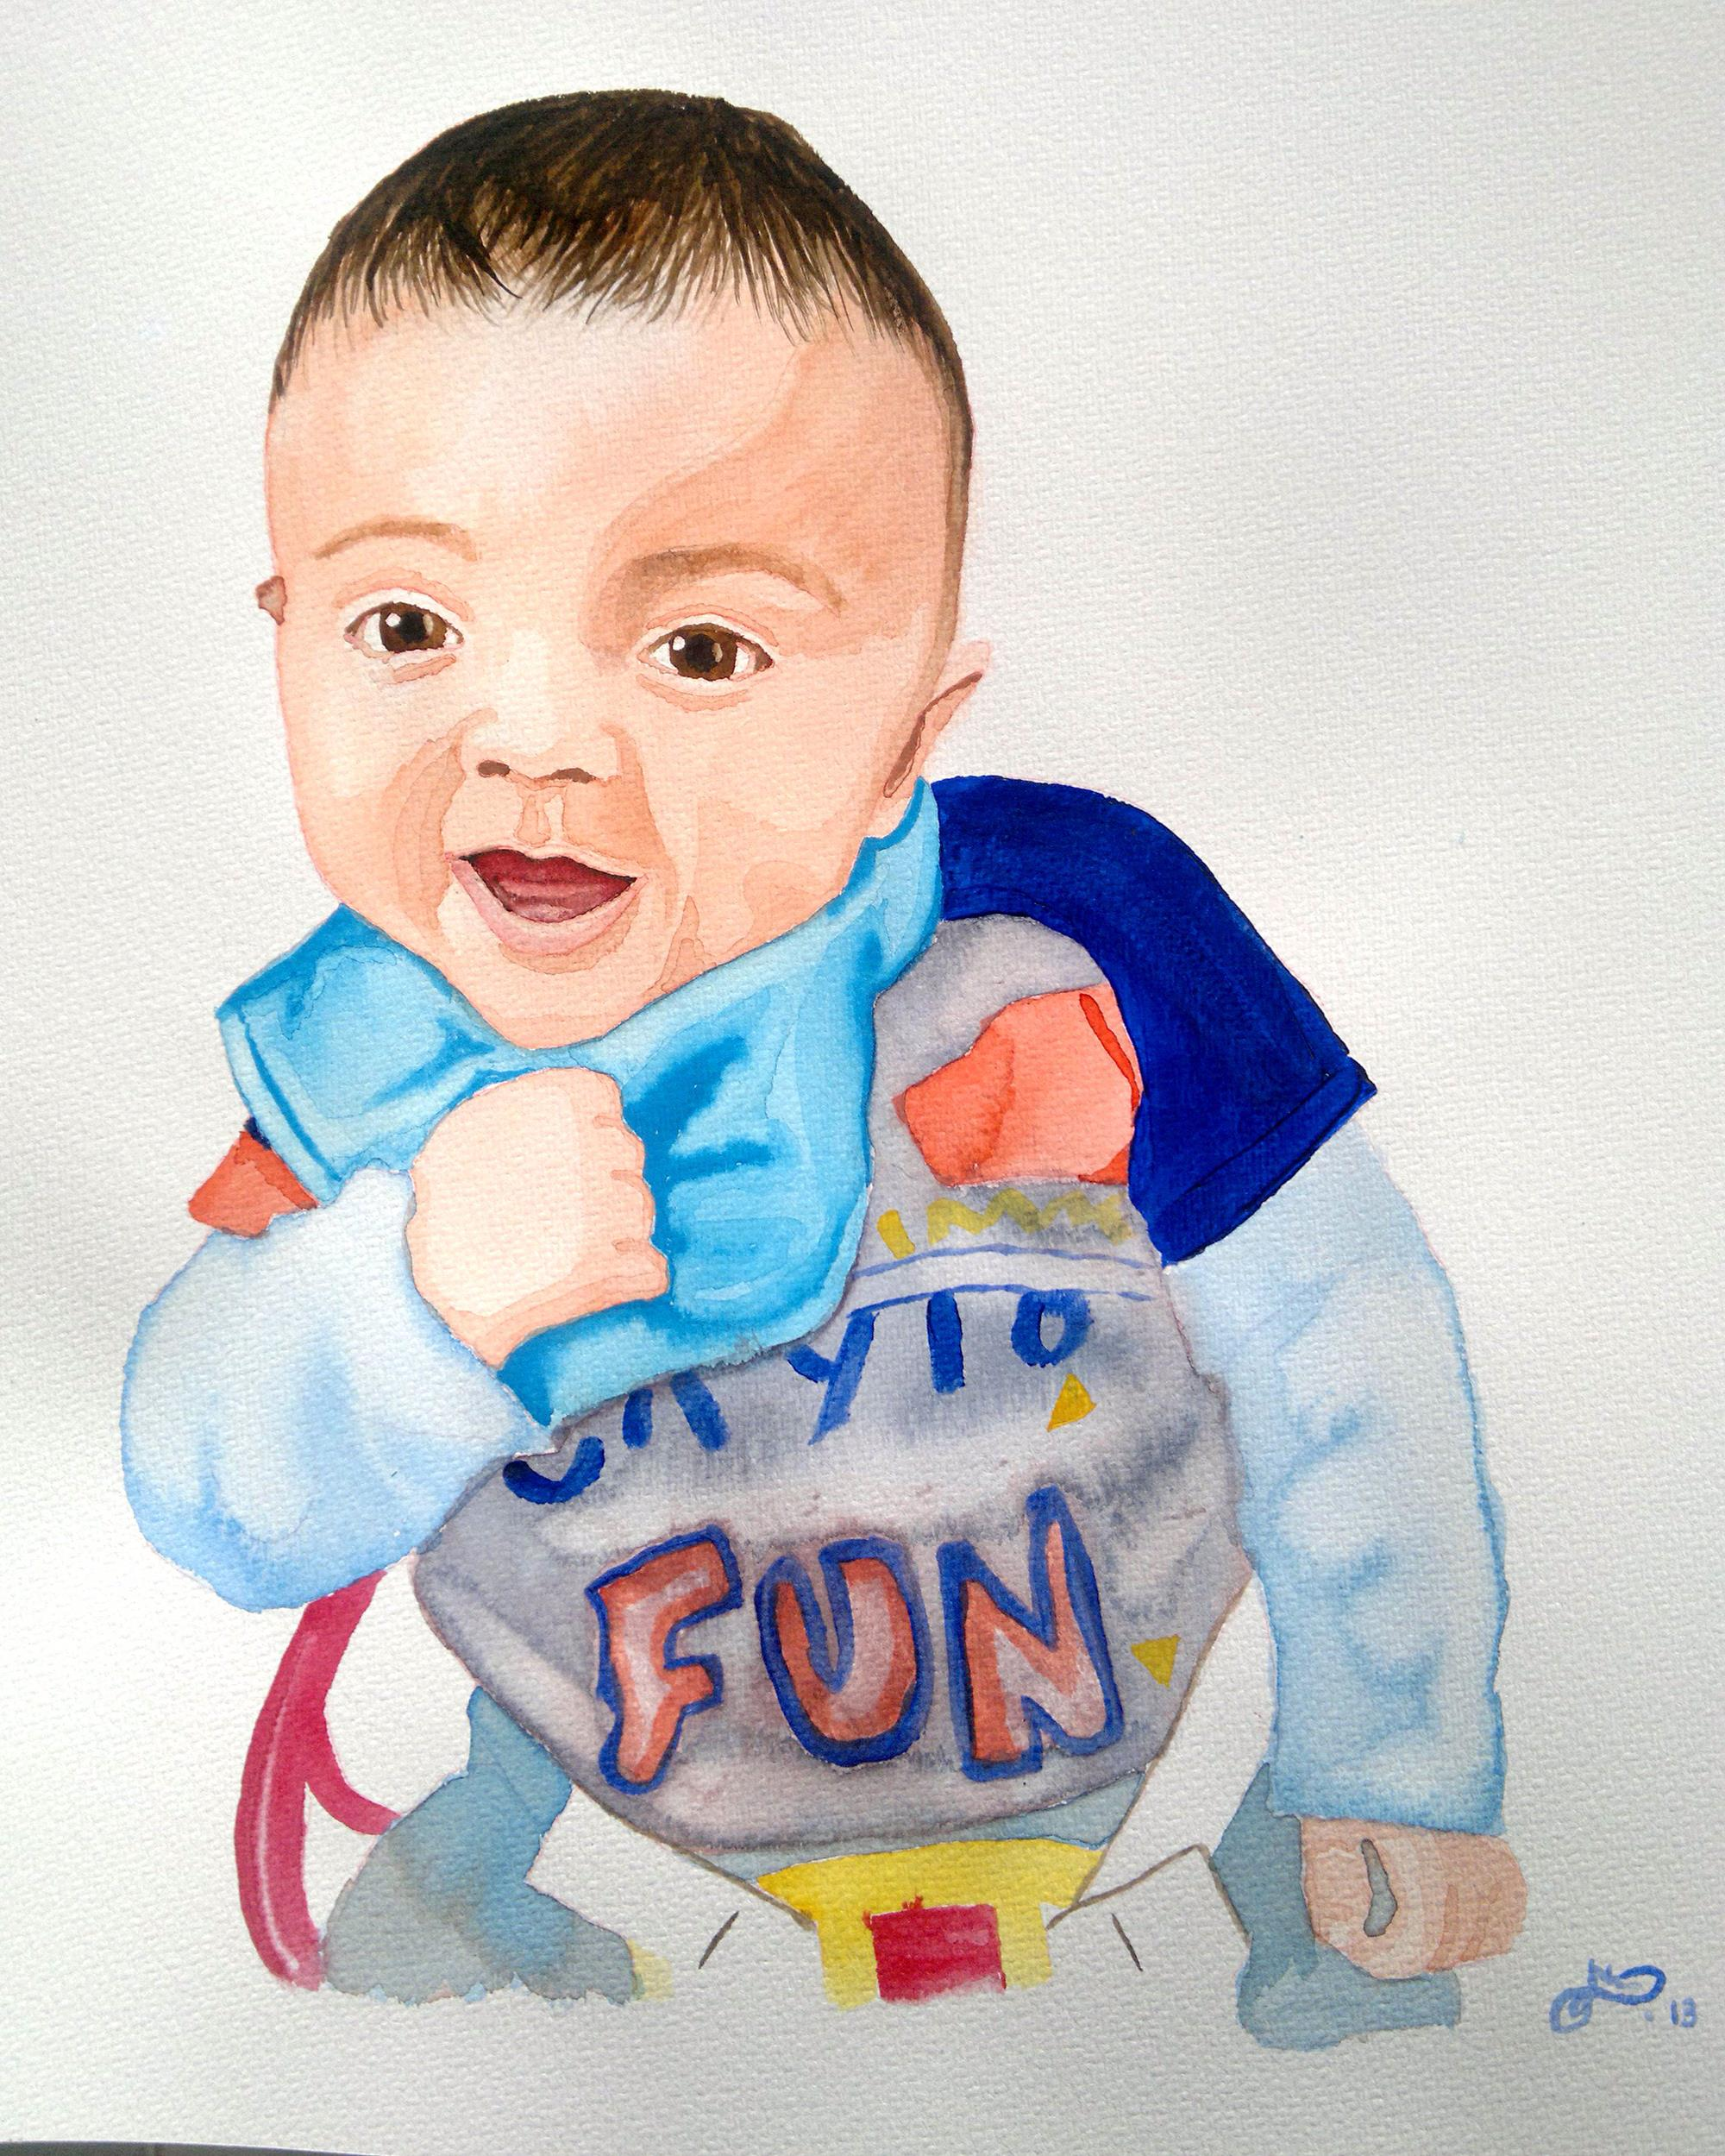 acuarela-retrato-bebe